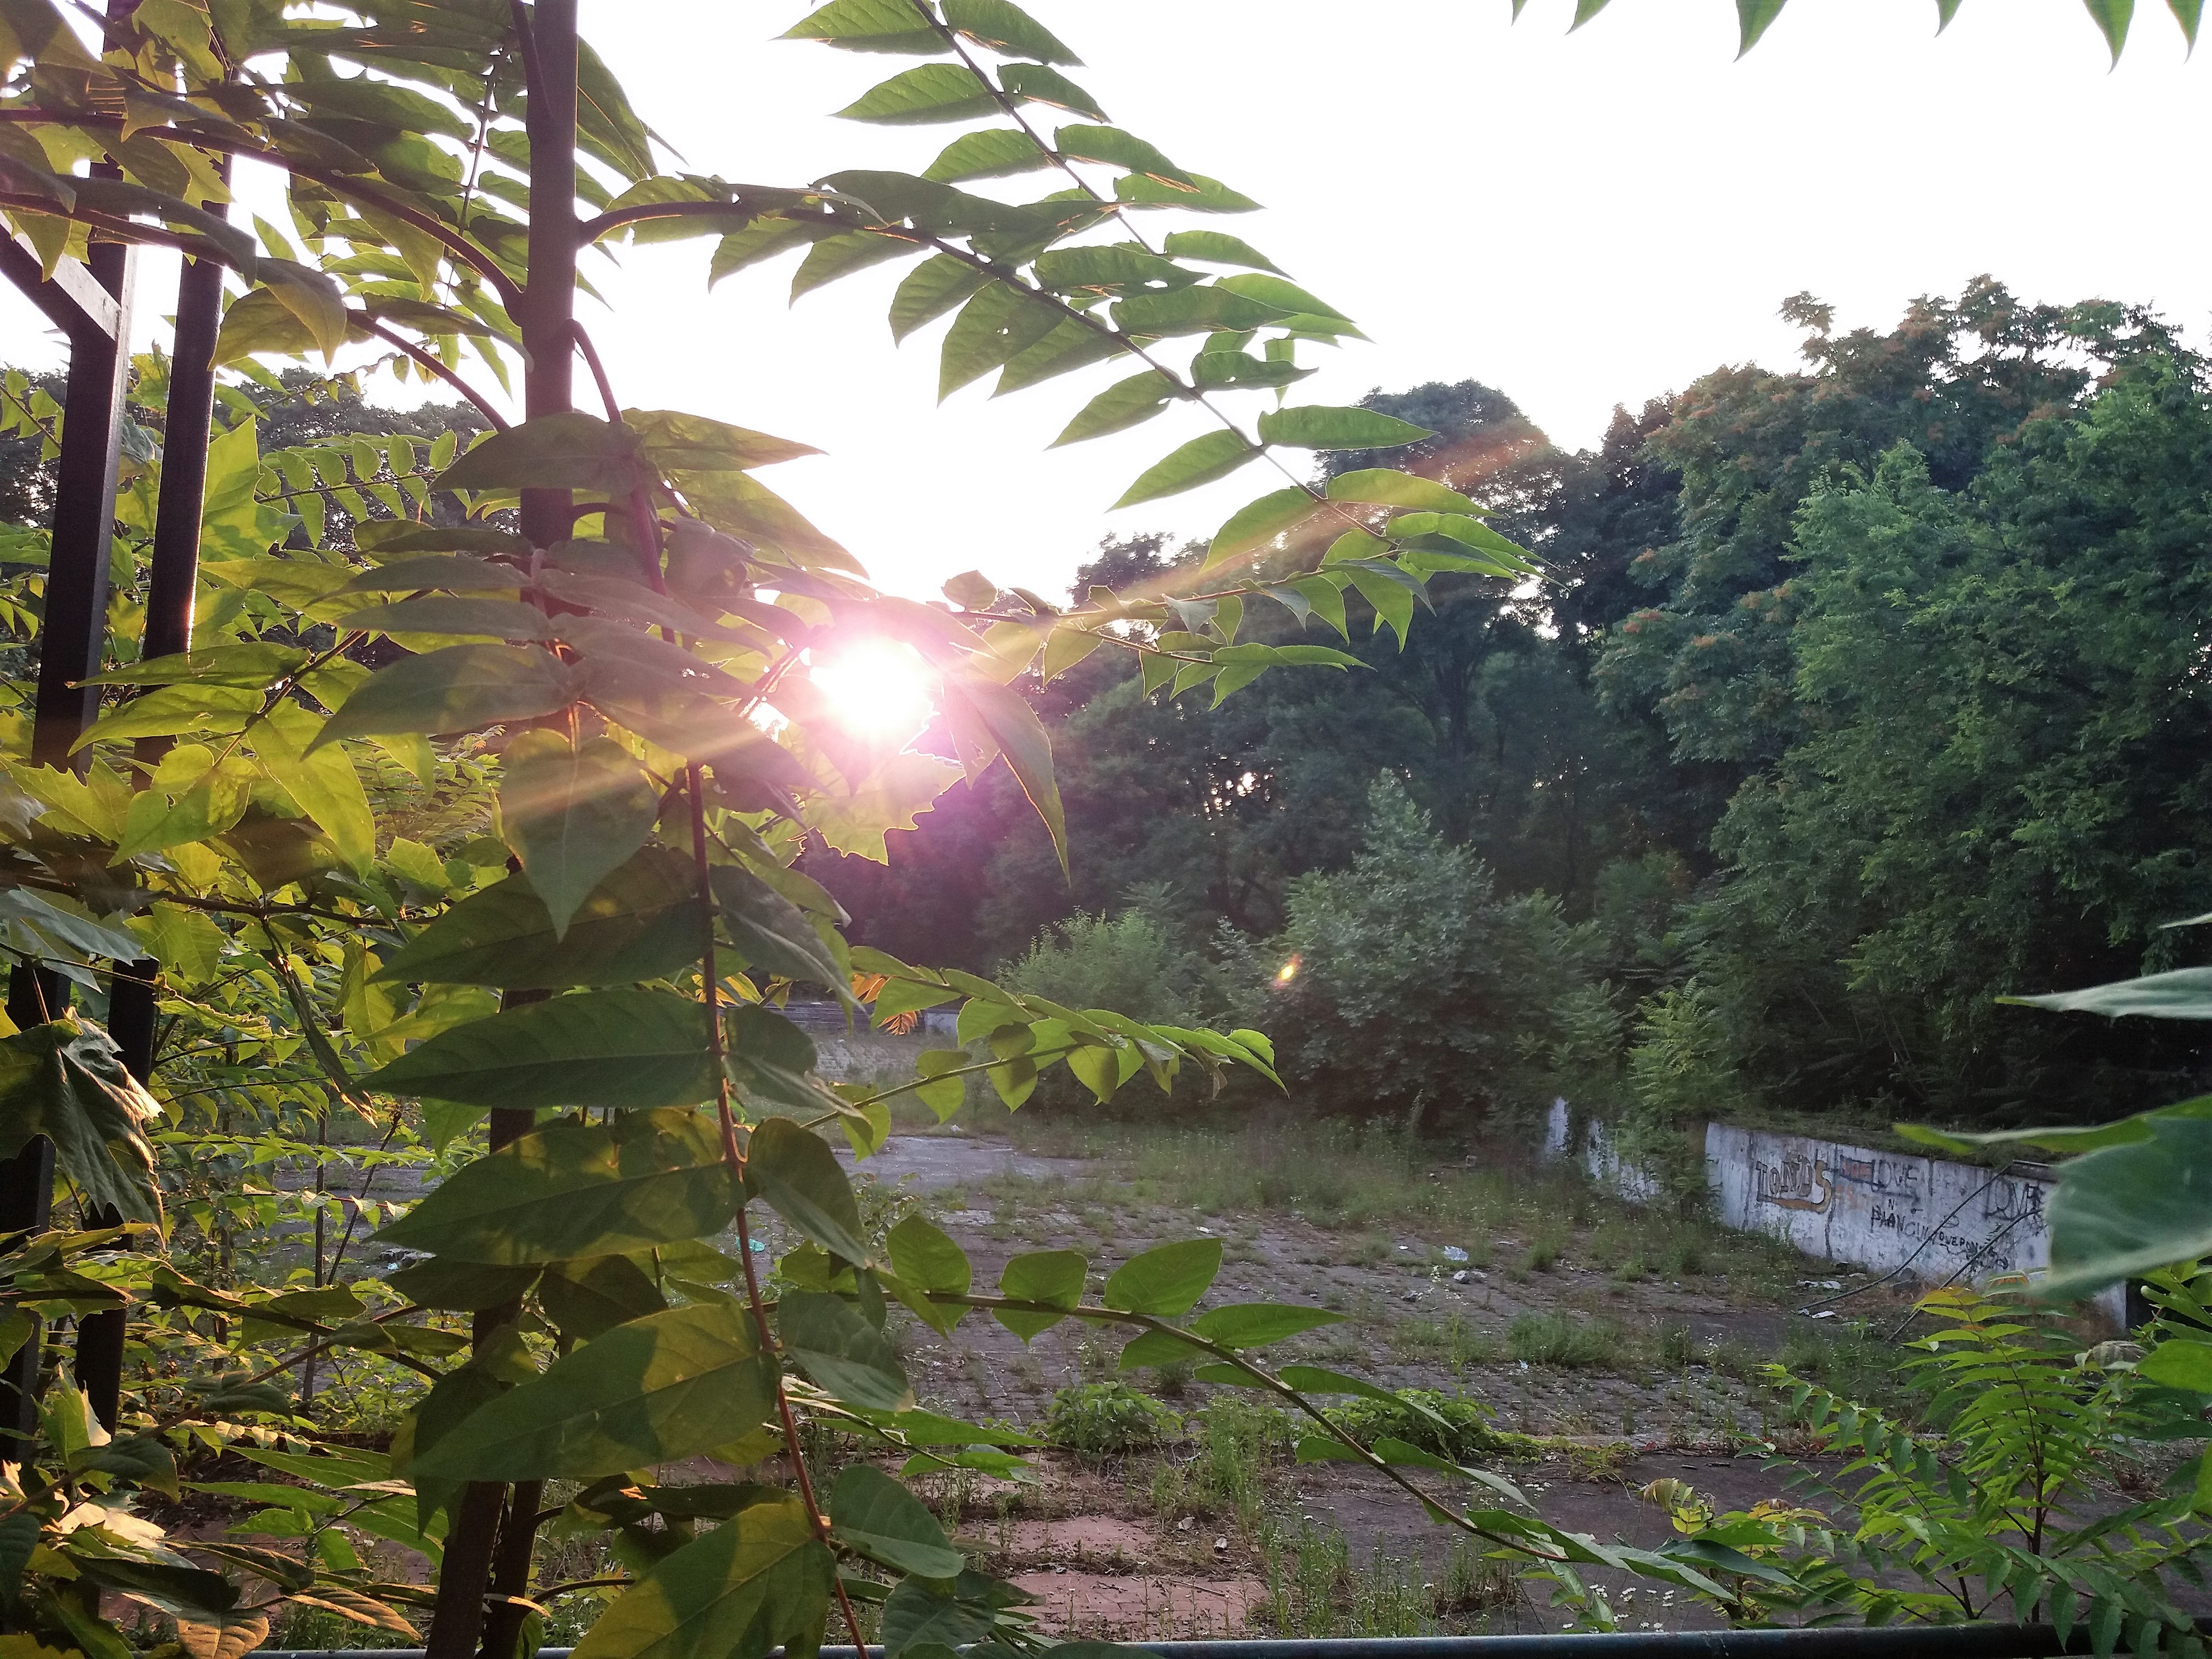 Piscina al Parco Trotter